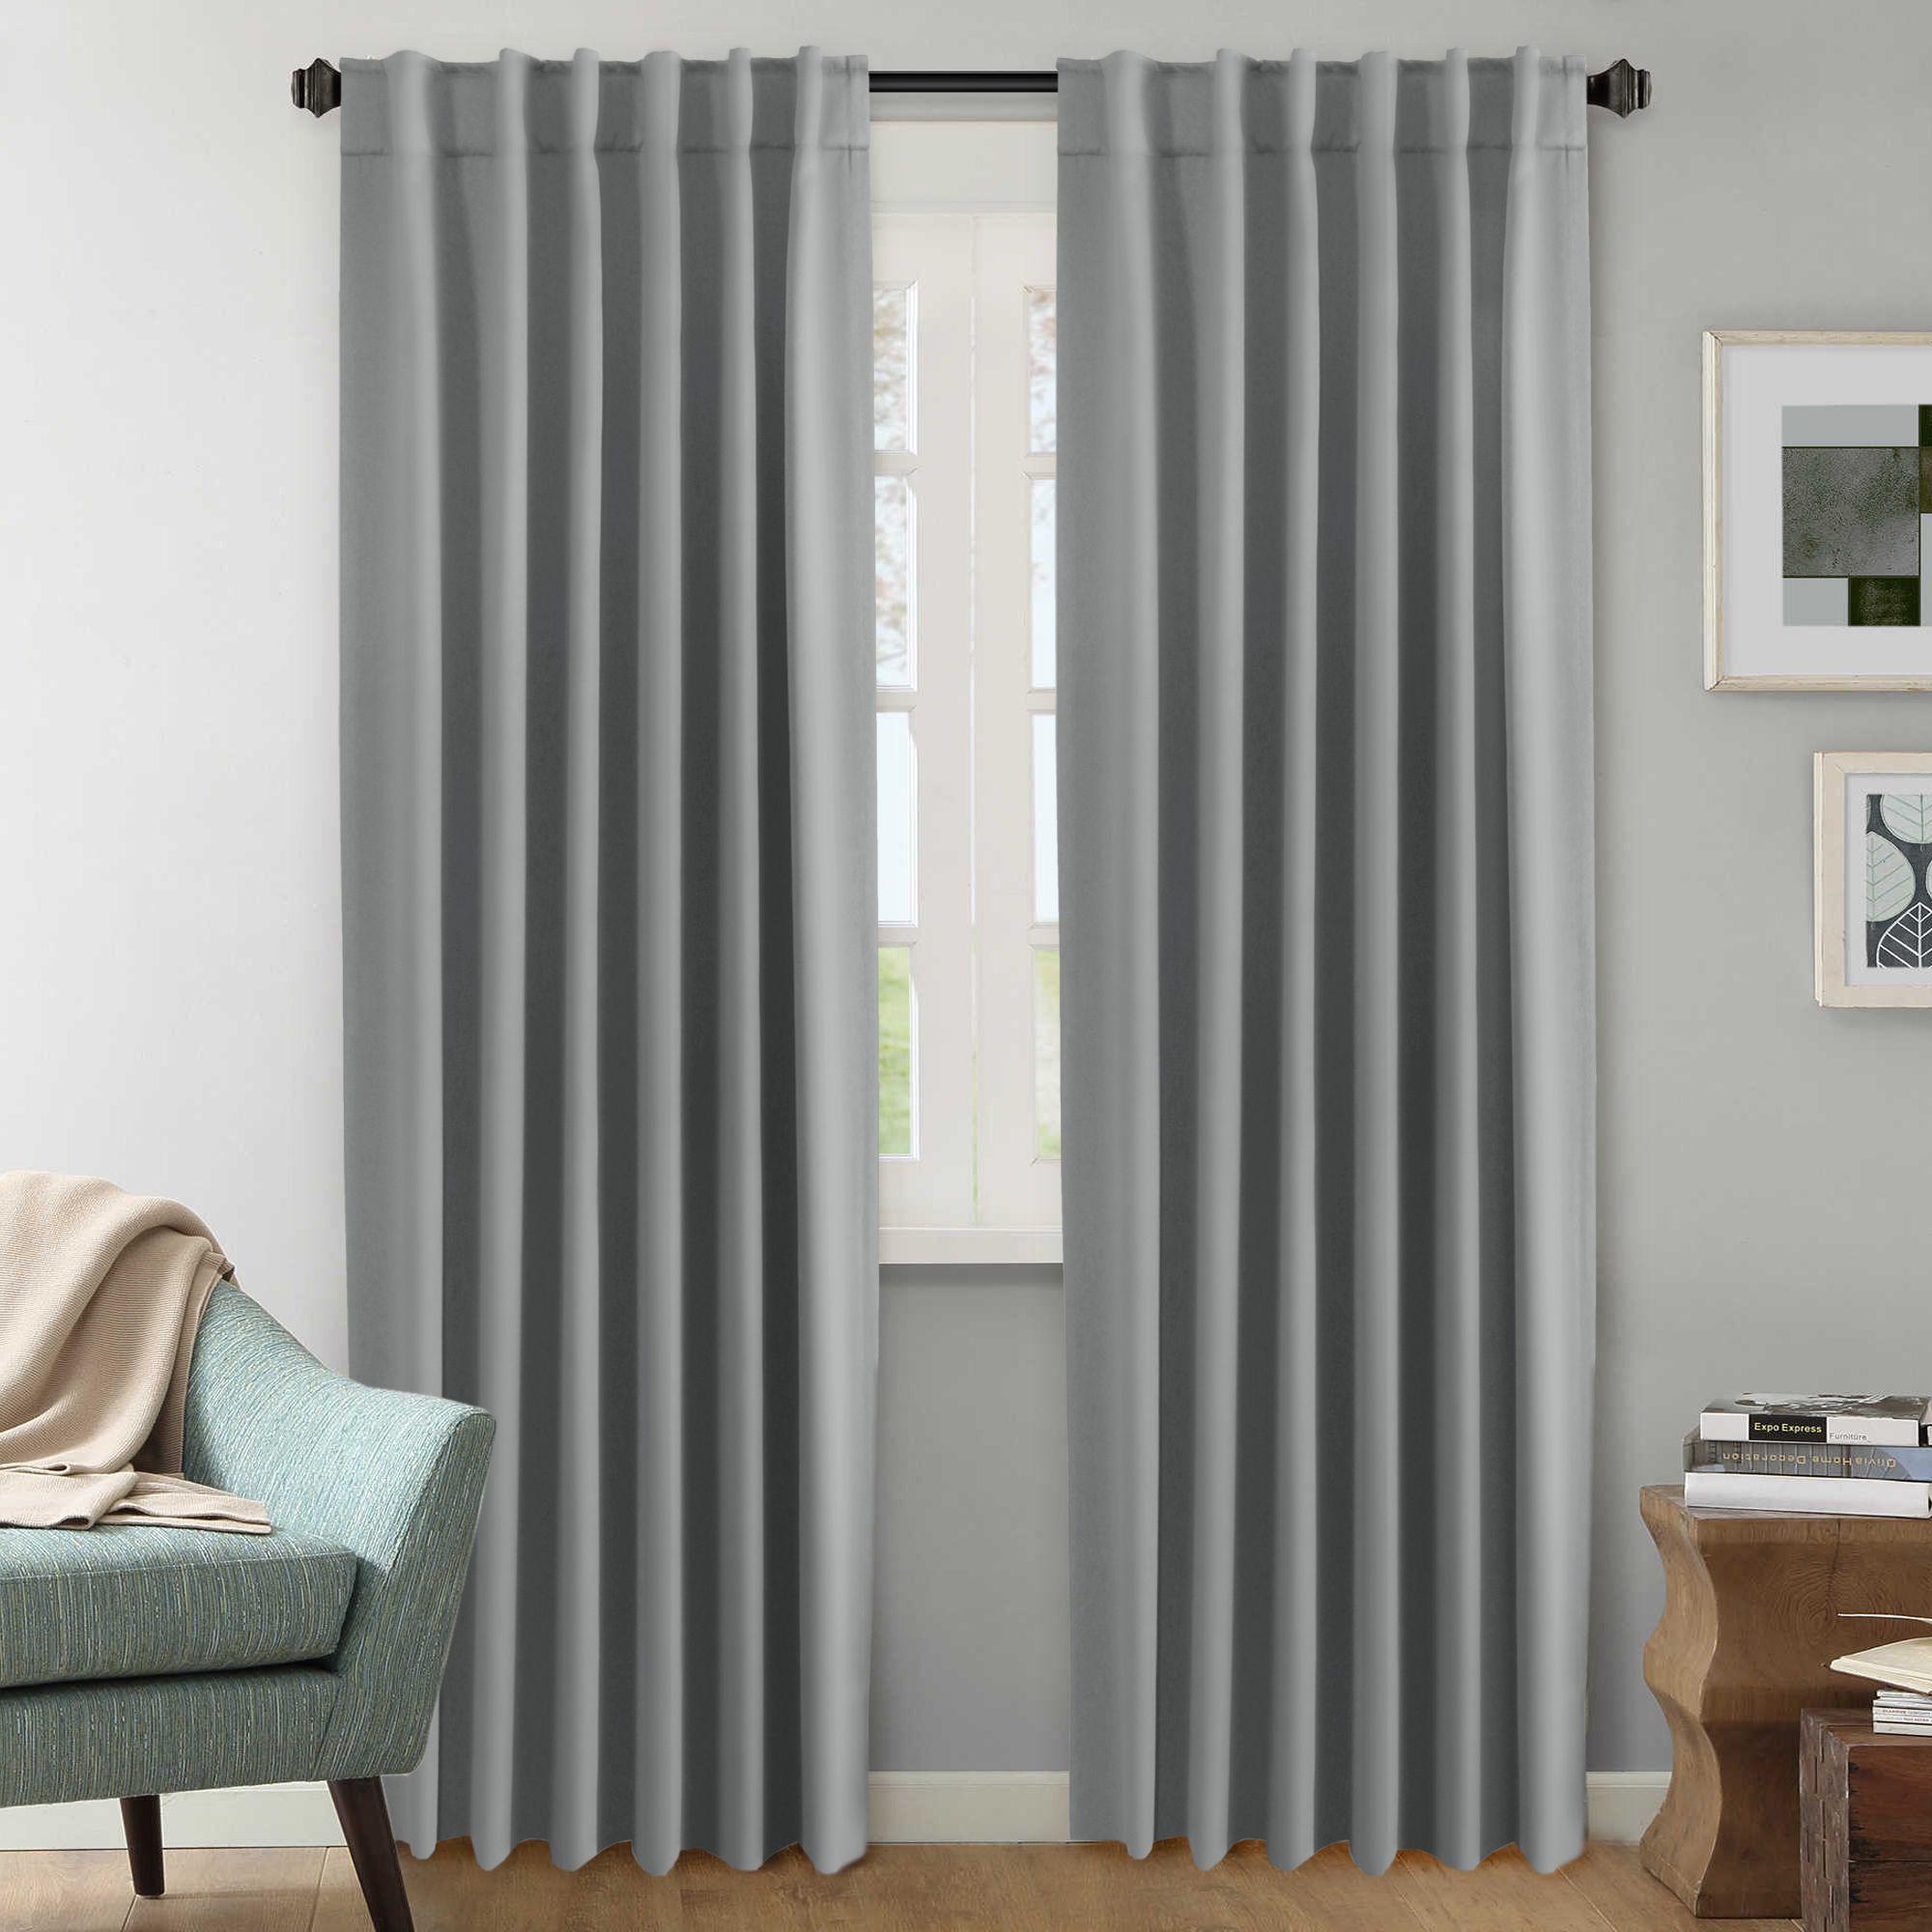 2 Panels Pair Curtains Blockout For Living Room Bedroom Rod Pocket Back Tab Top Blackout Window Curtain Drapes Dove Grey Matt Blatt